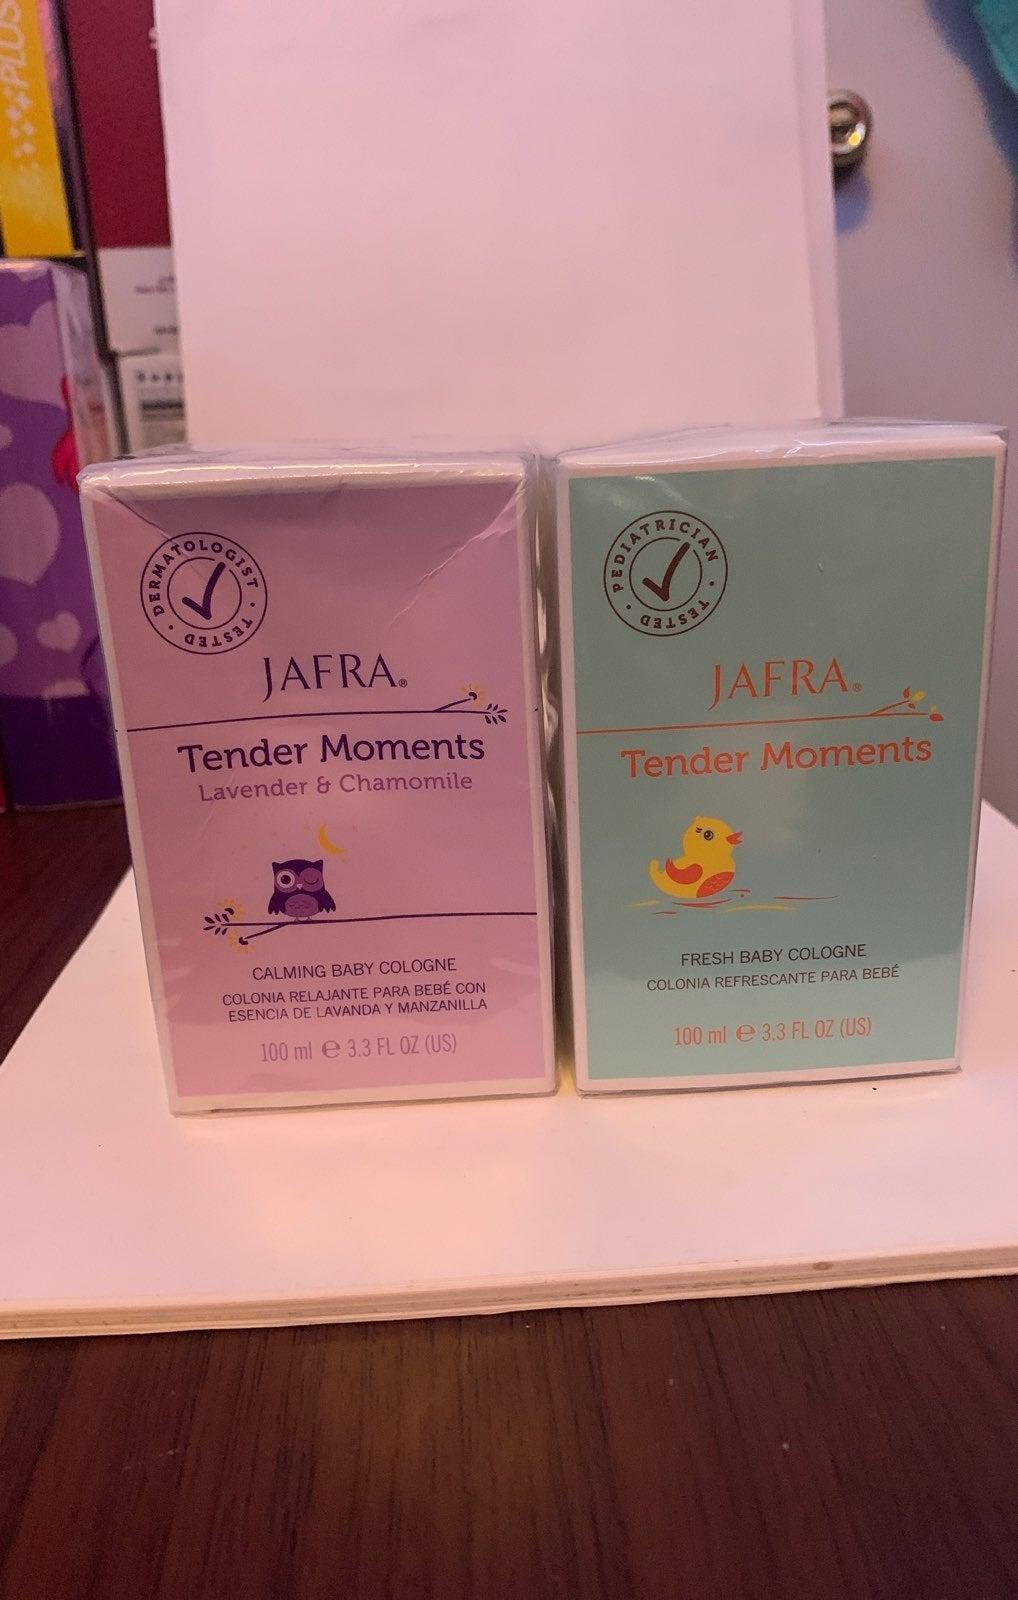 Jafra Tender moments perfume